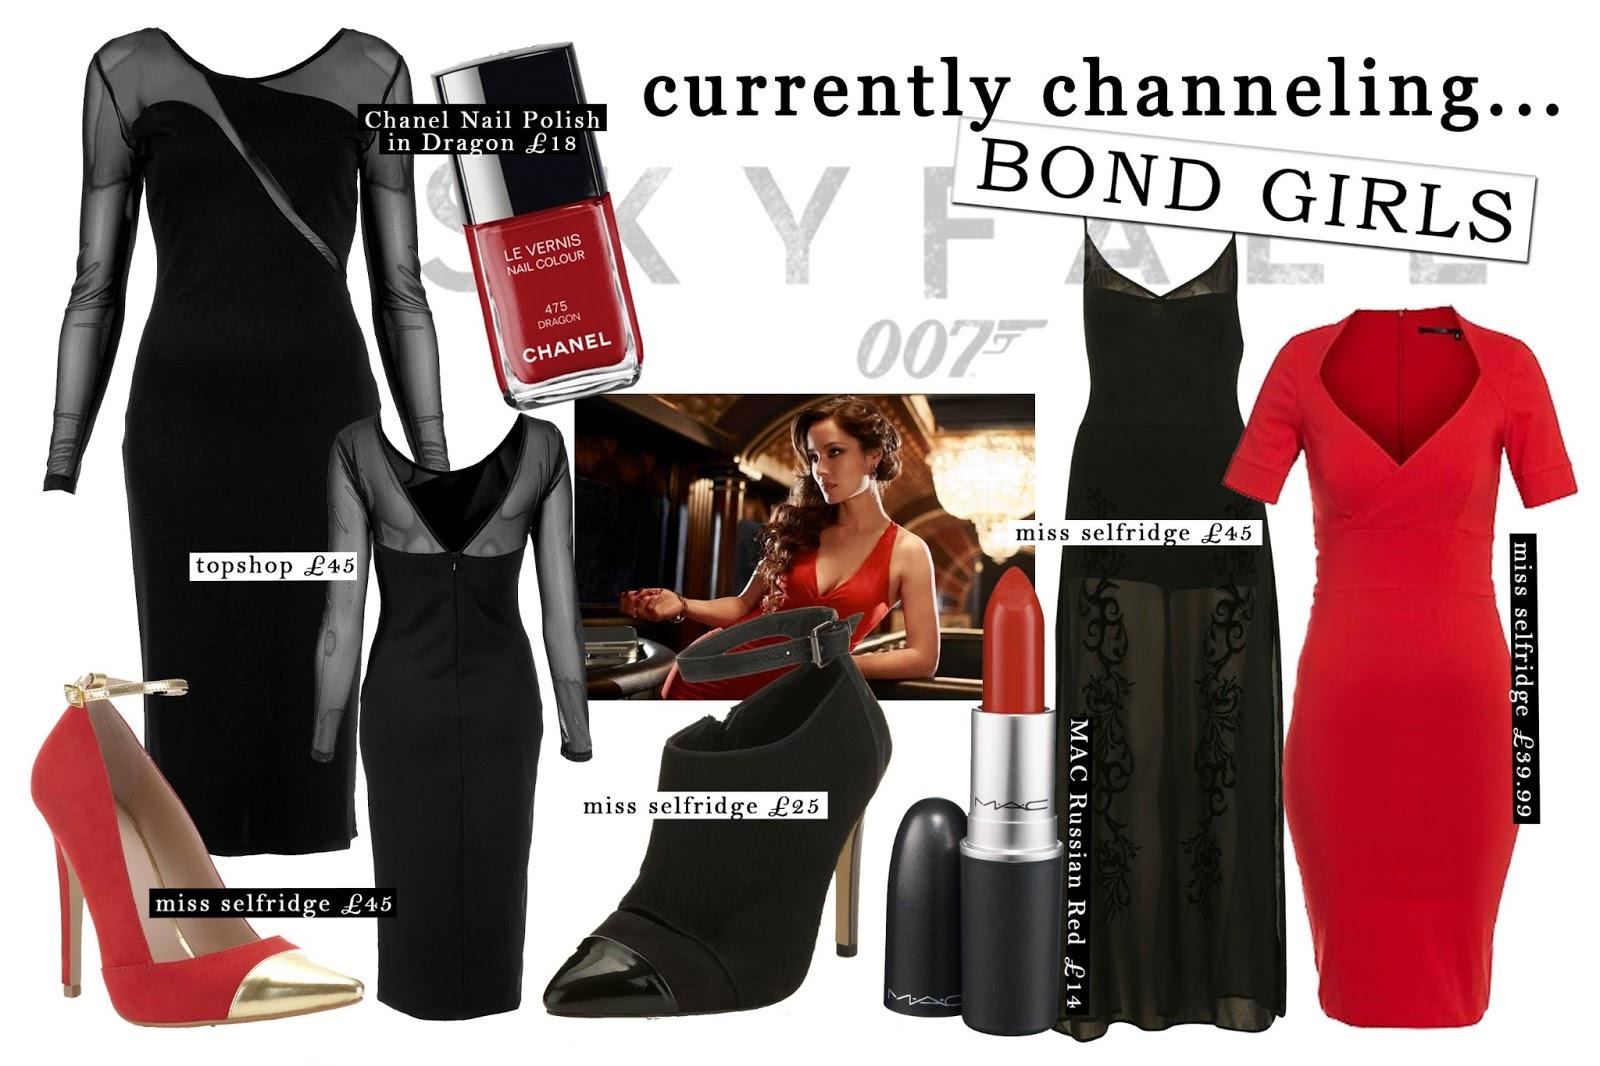 Melissa George In White Ursula Andress Bikini Ala Doctor No Honey Rider Bond